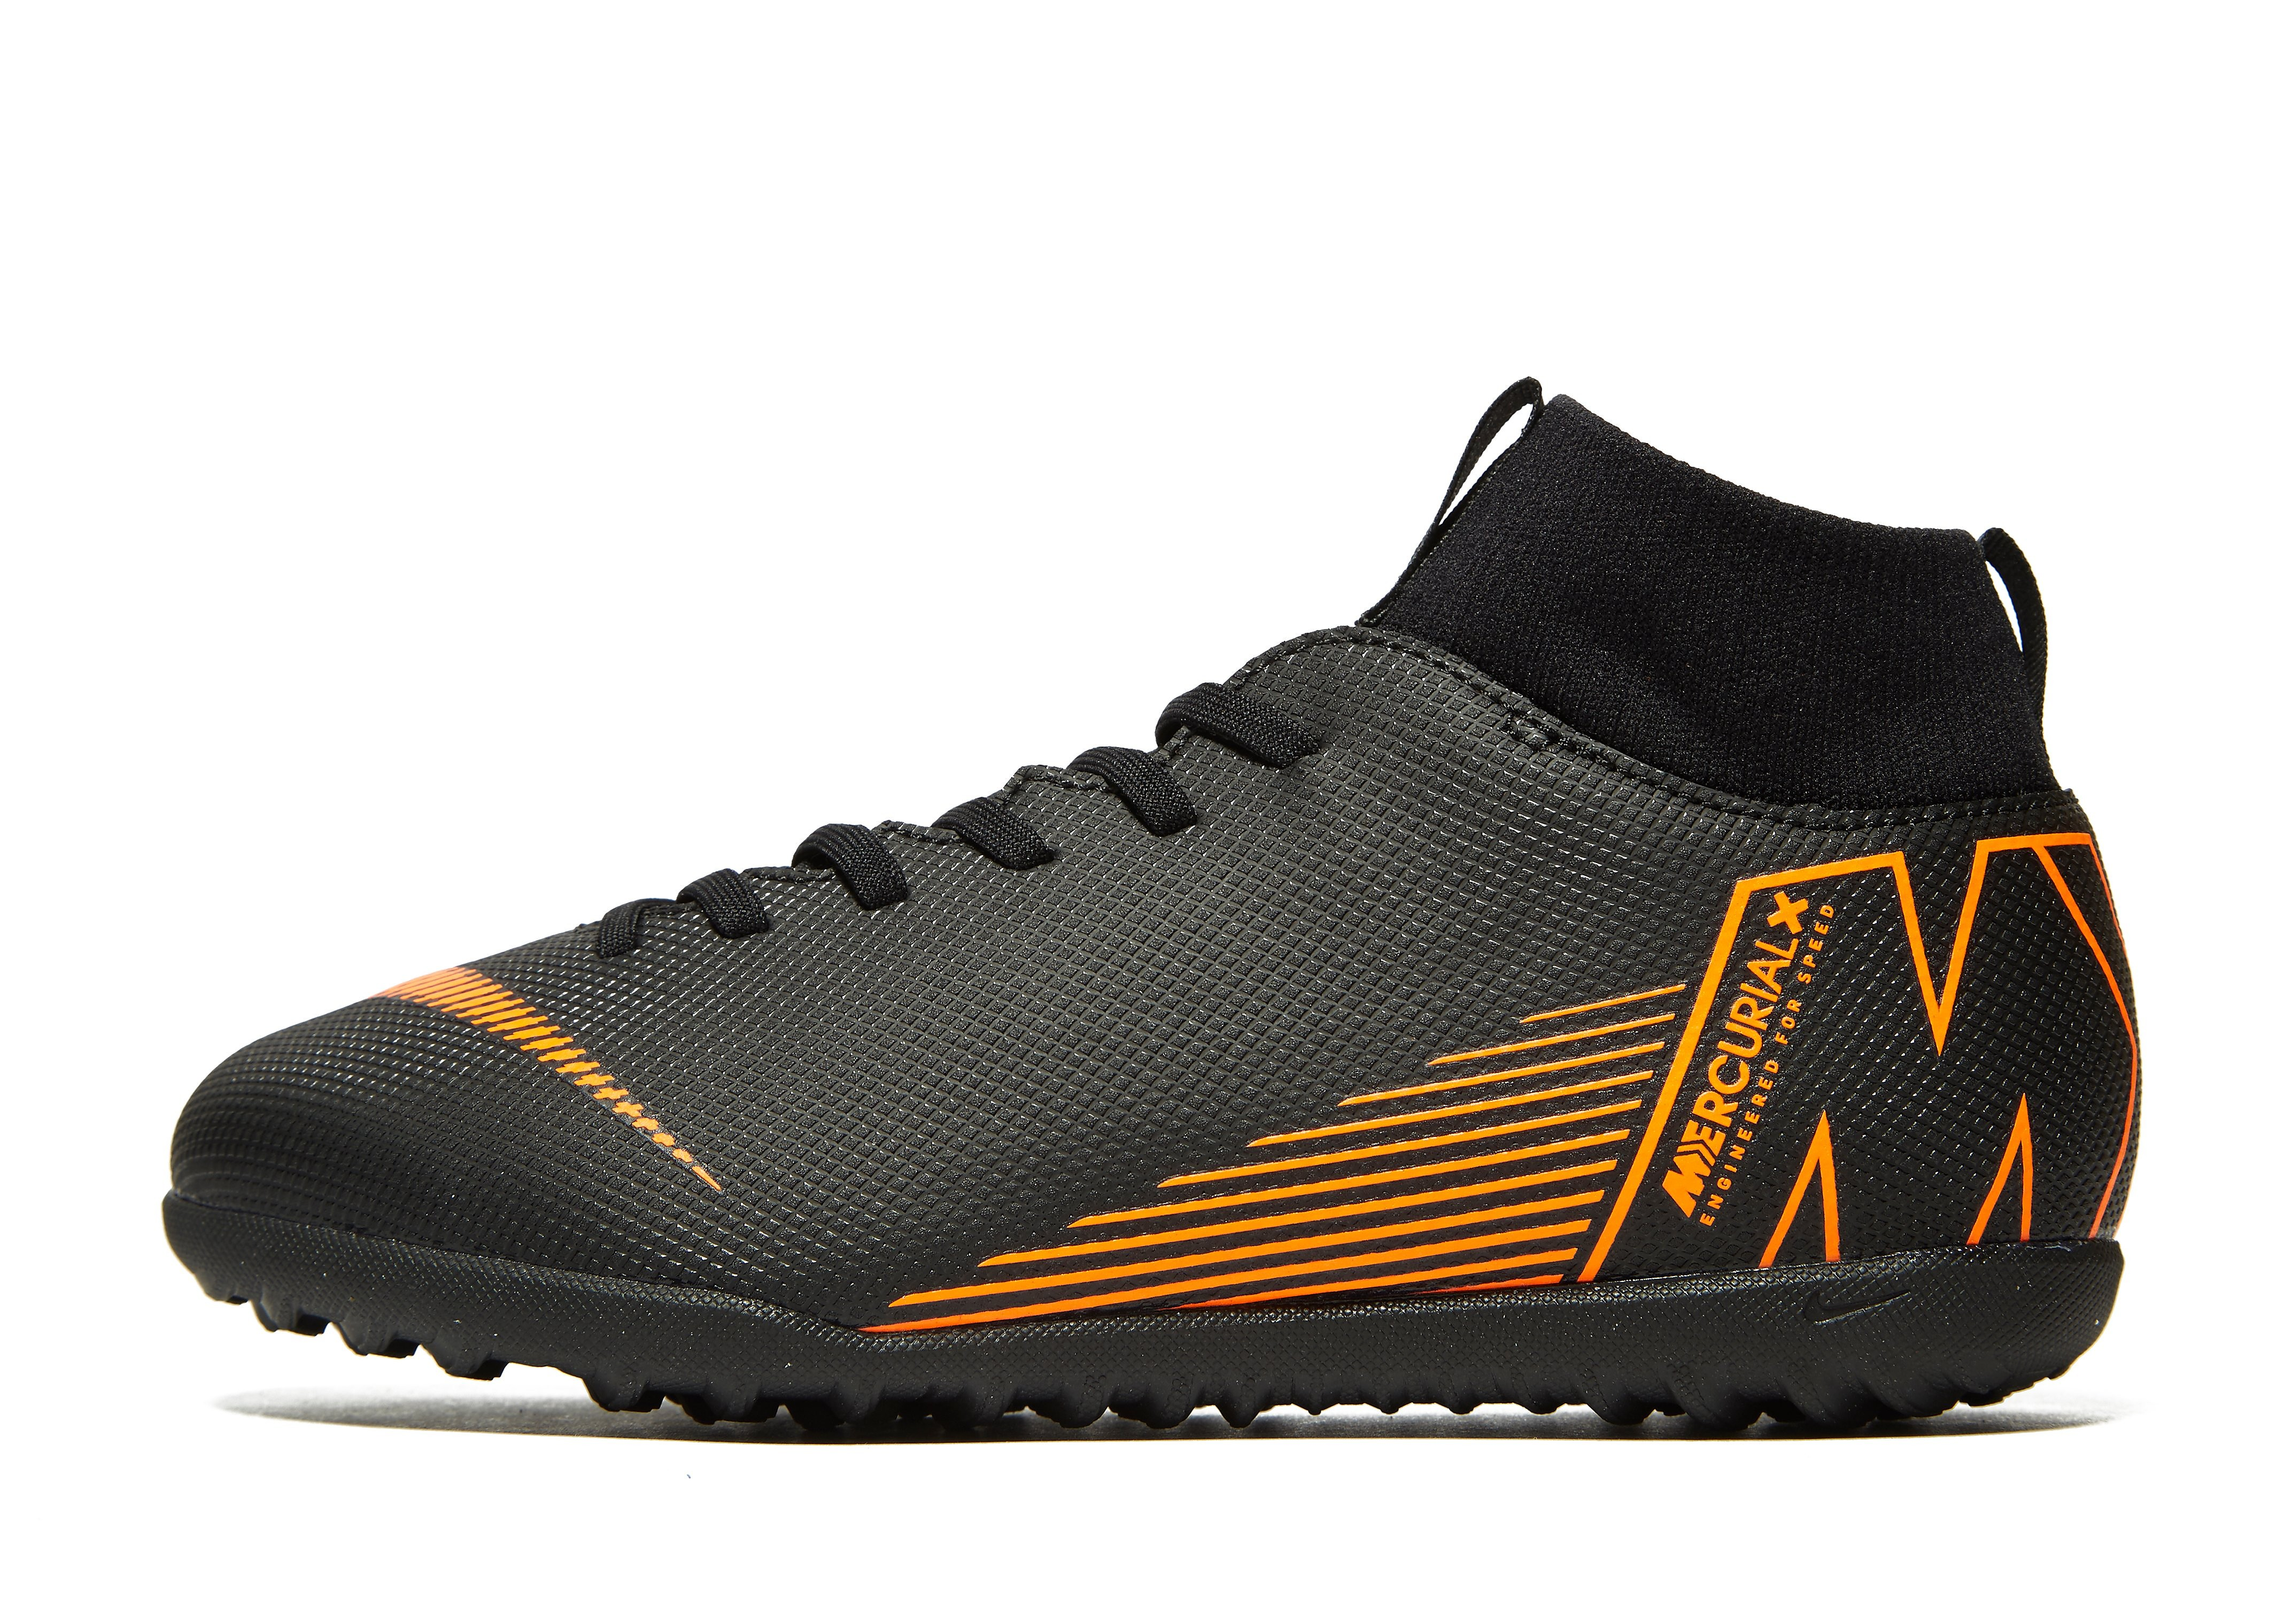 Nike Mercurial 360 SuperFly Dynamic Fit TF Junior